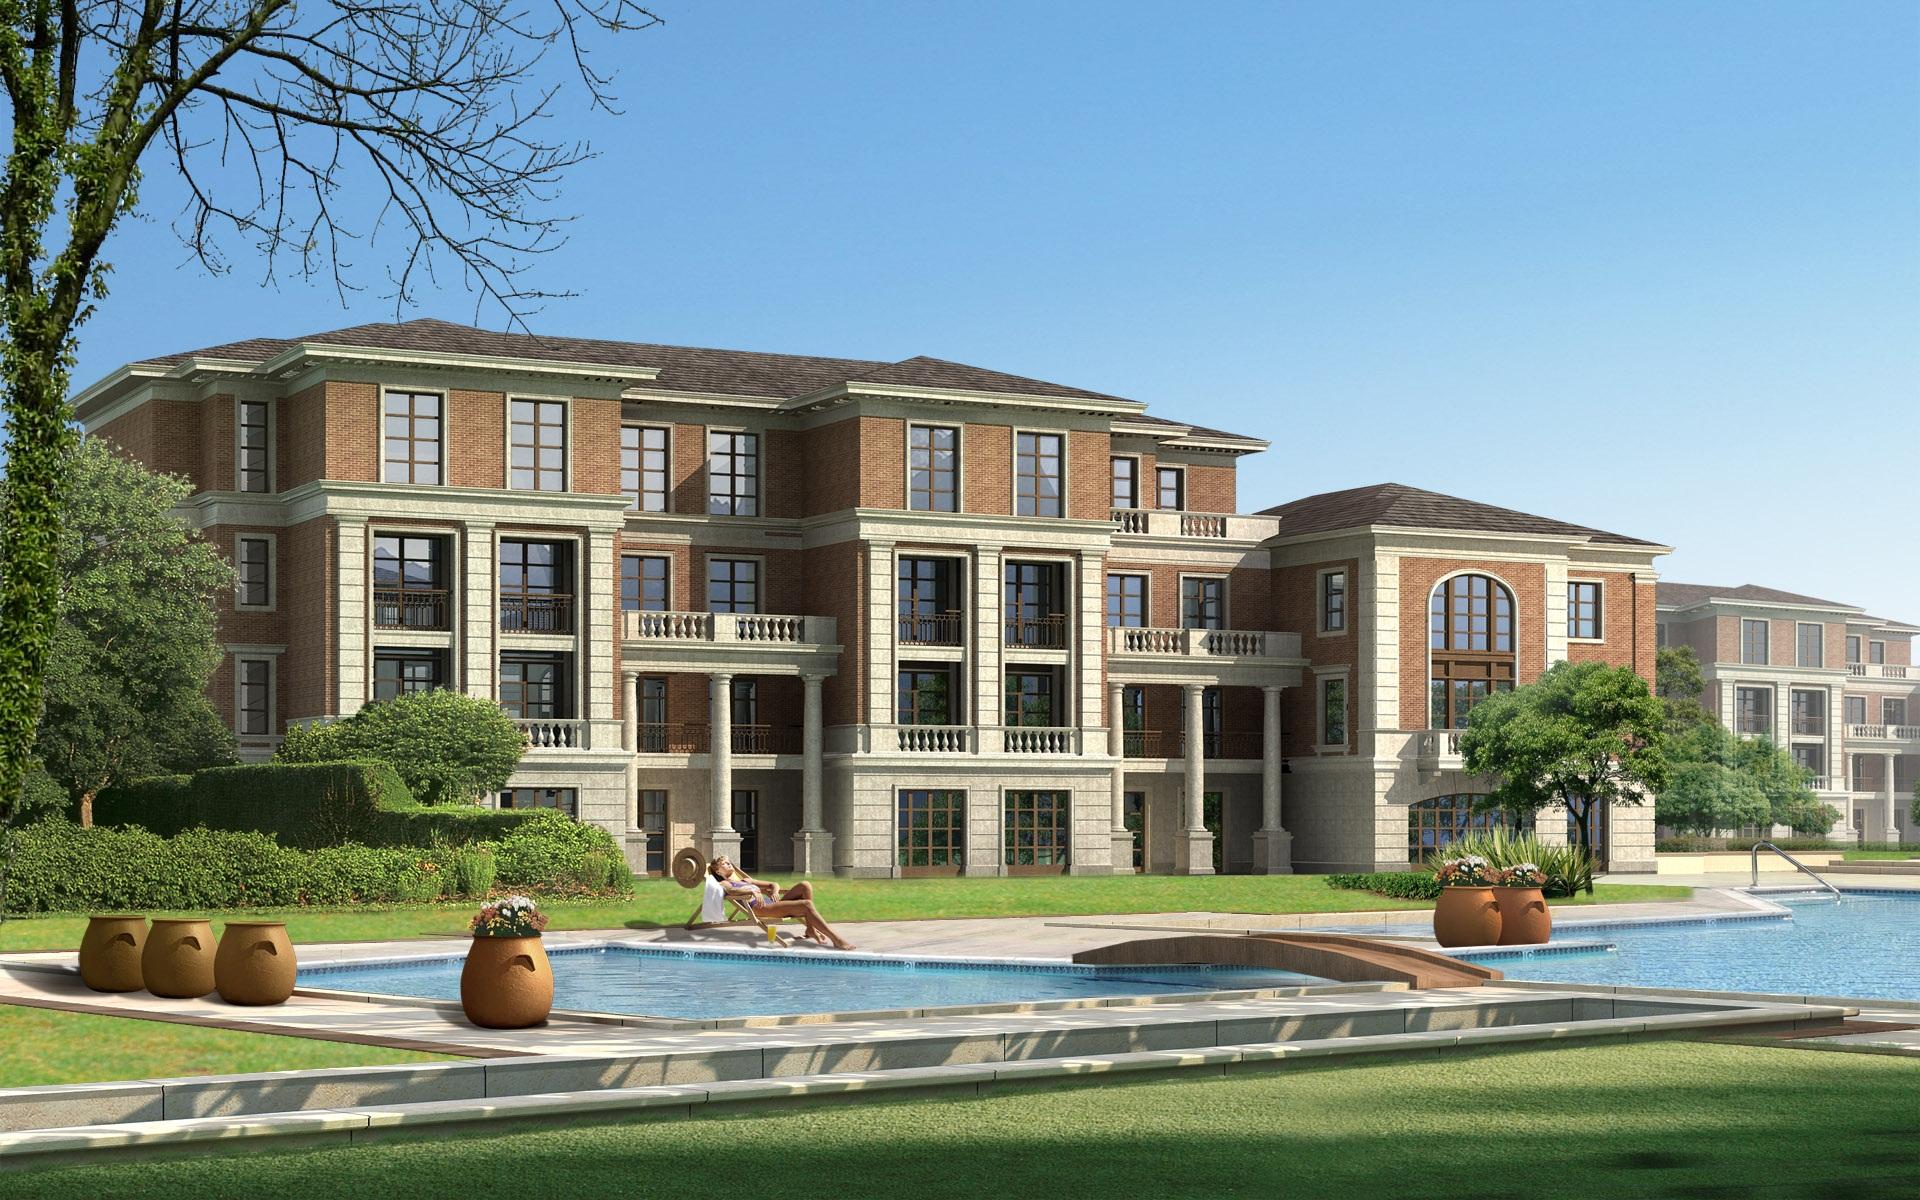 Design of best house in world wallpaper HD Wallpapers Rocks 1920x1200